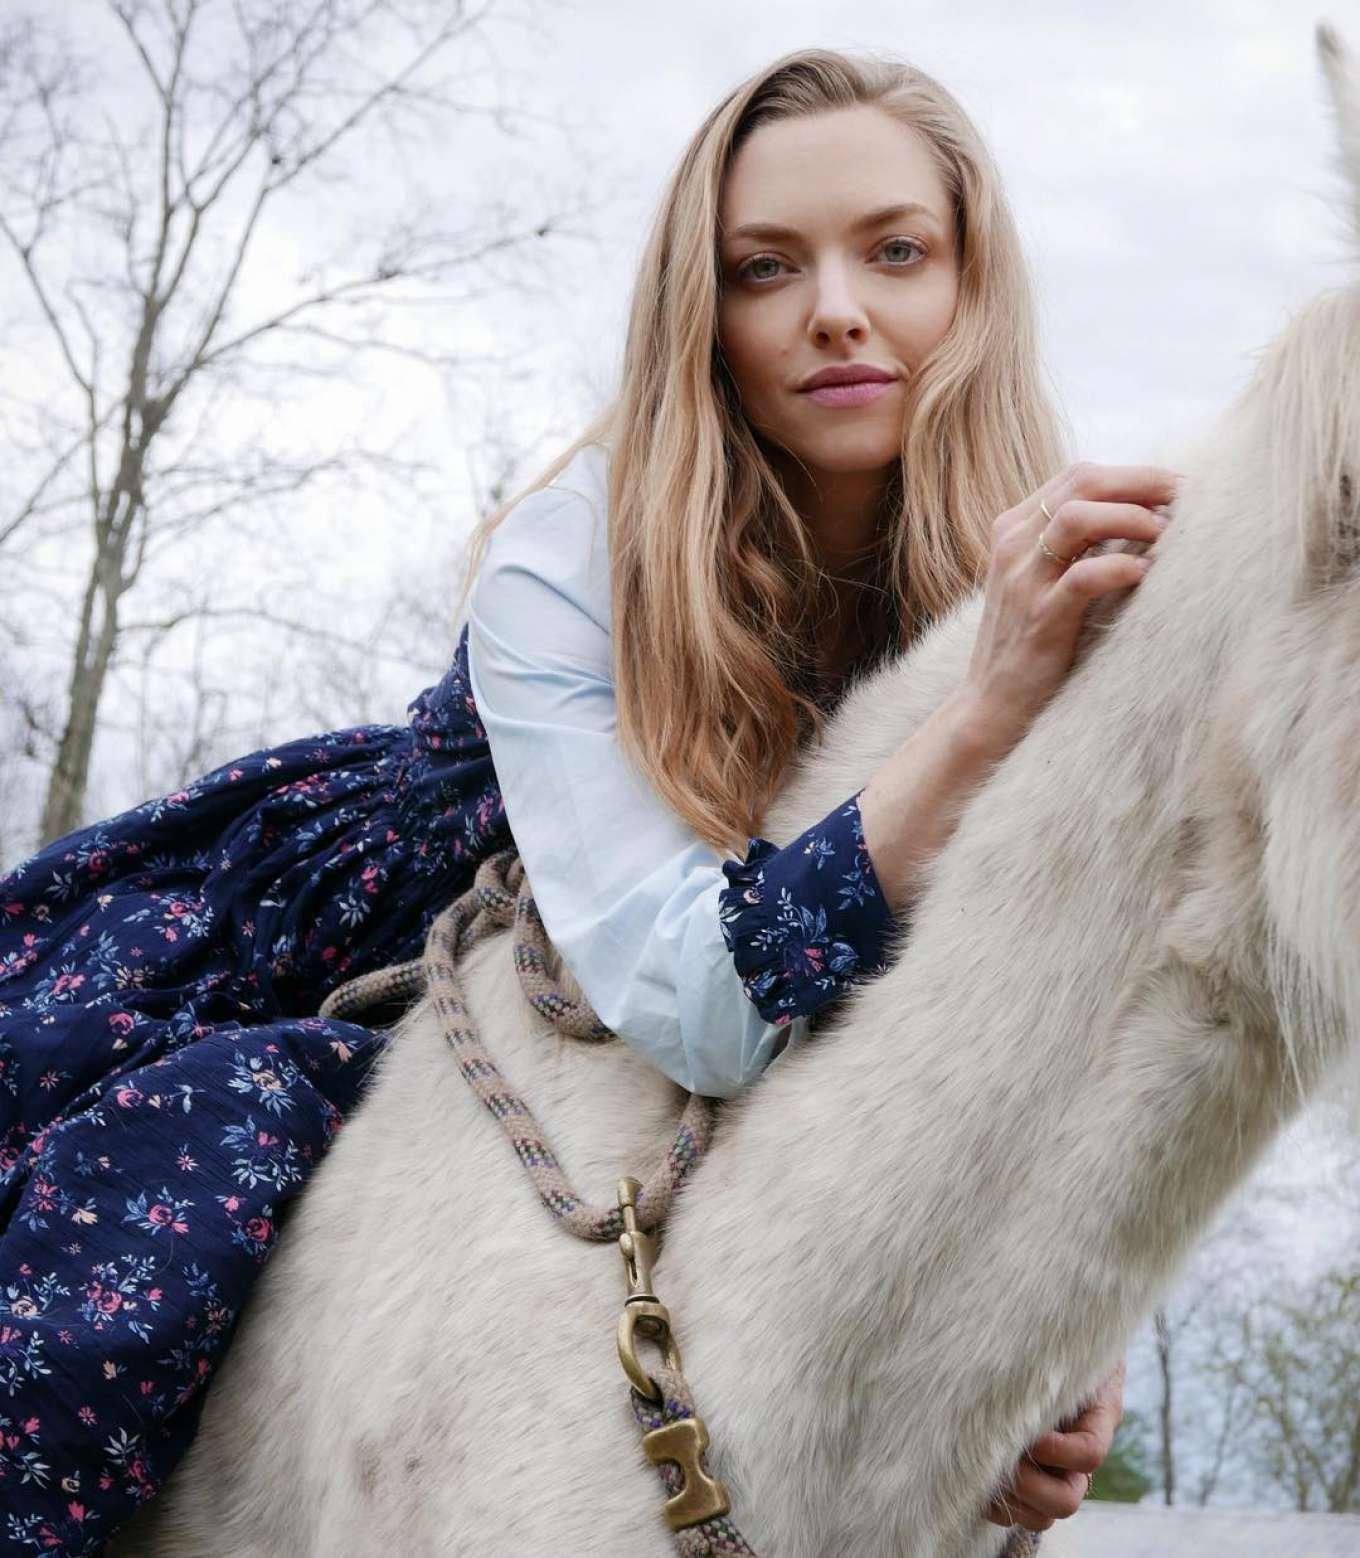 Amanda Seyfried by Sasha O'Neill Photoshoot 2019